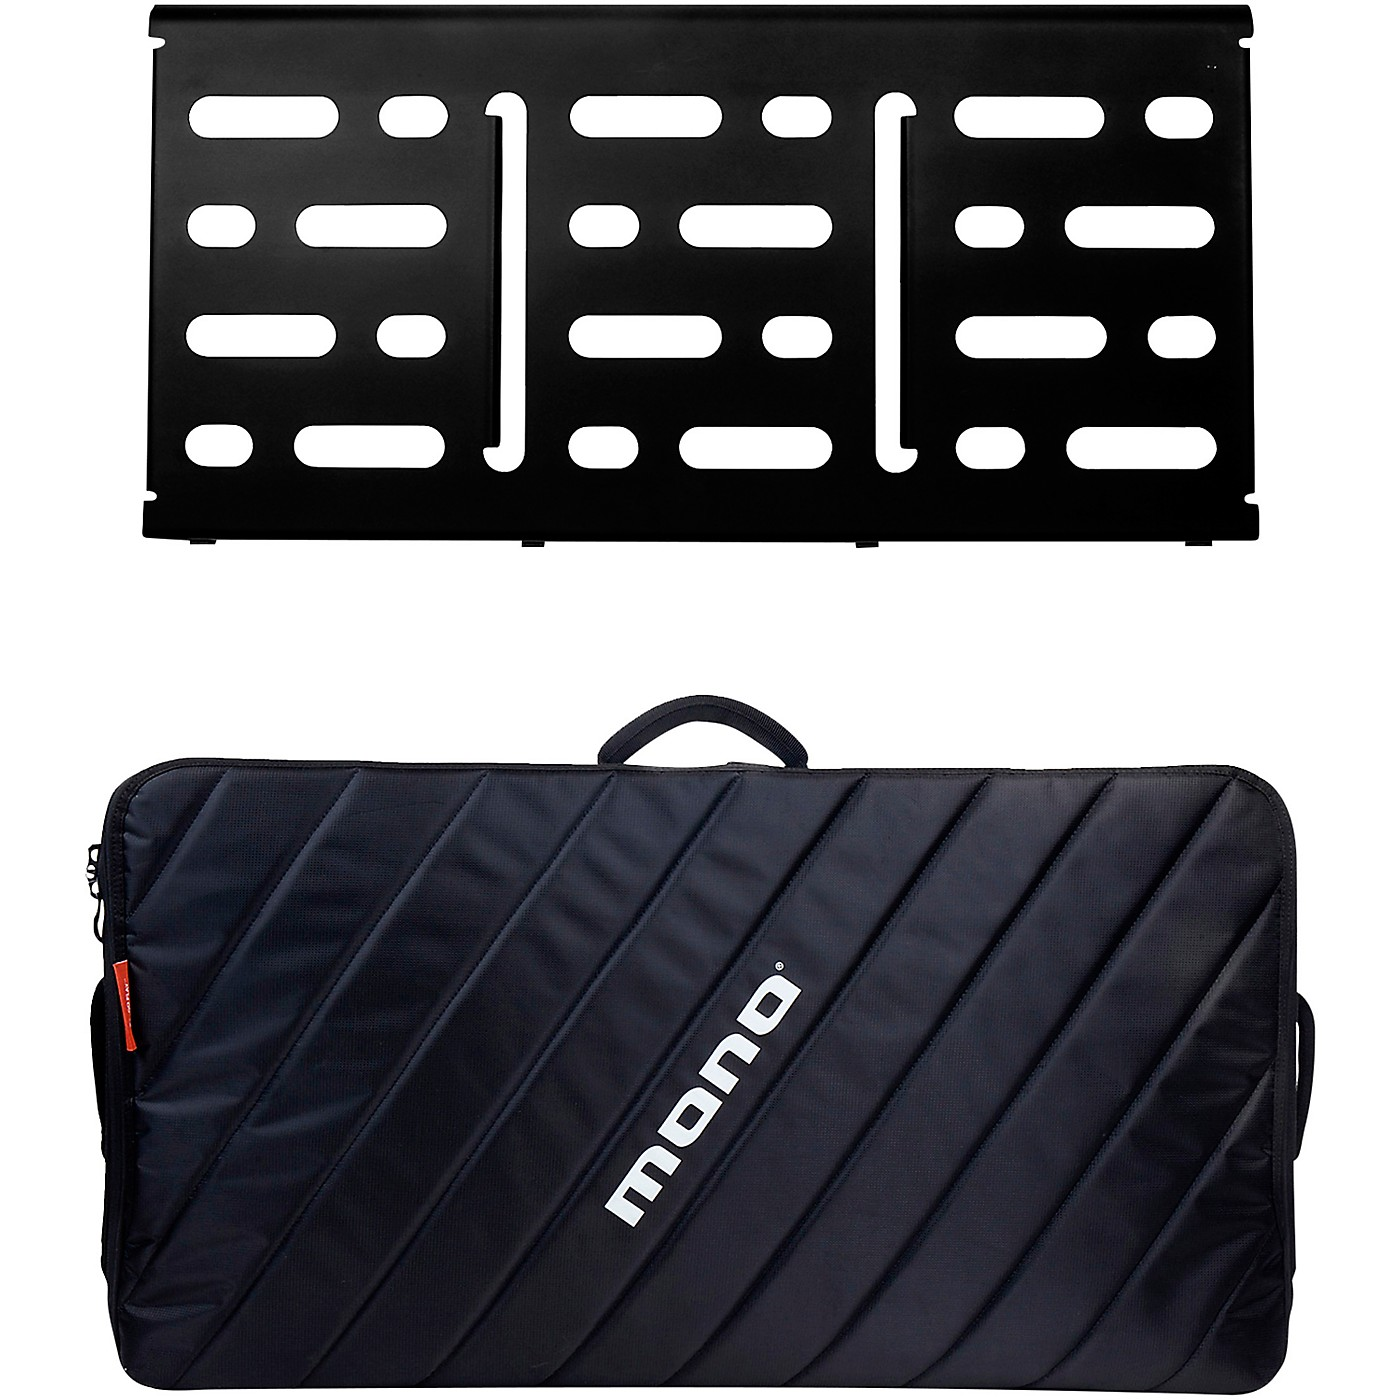 MONO Pedalboard Large, Black and Pro Accessory Case 2.0, Black thumbnail